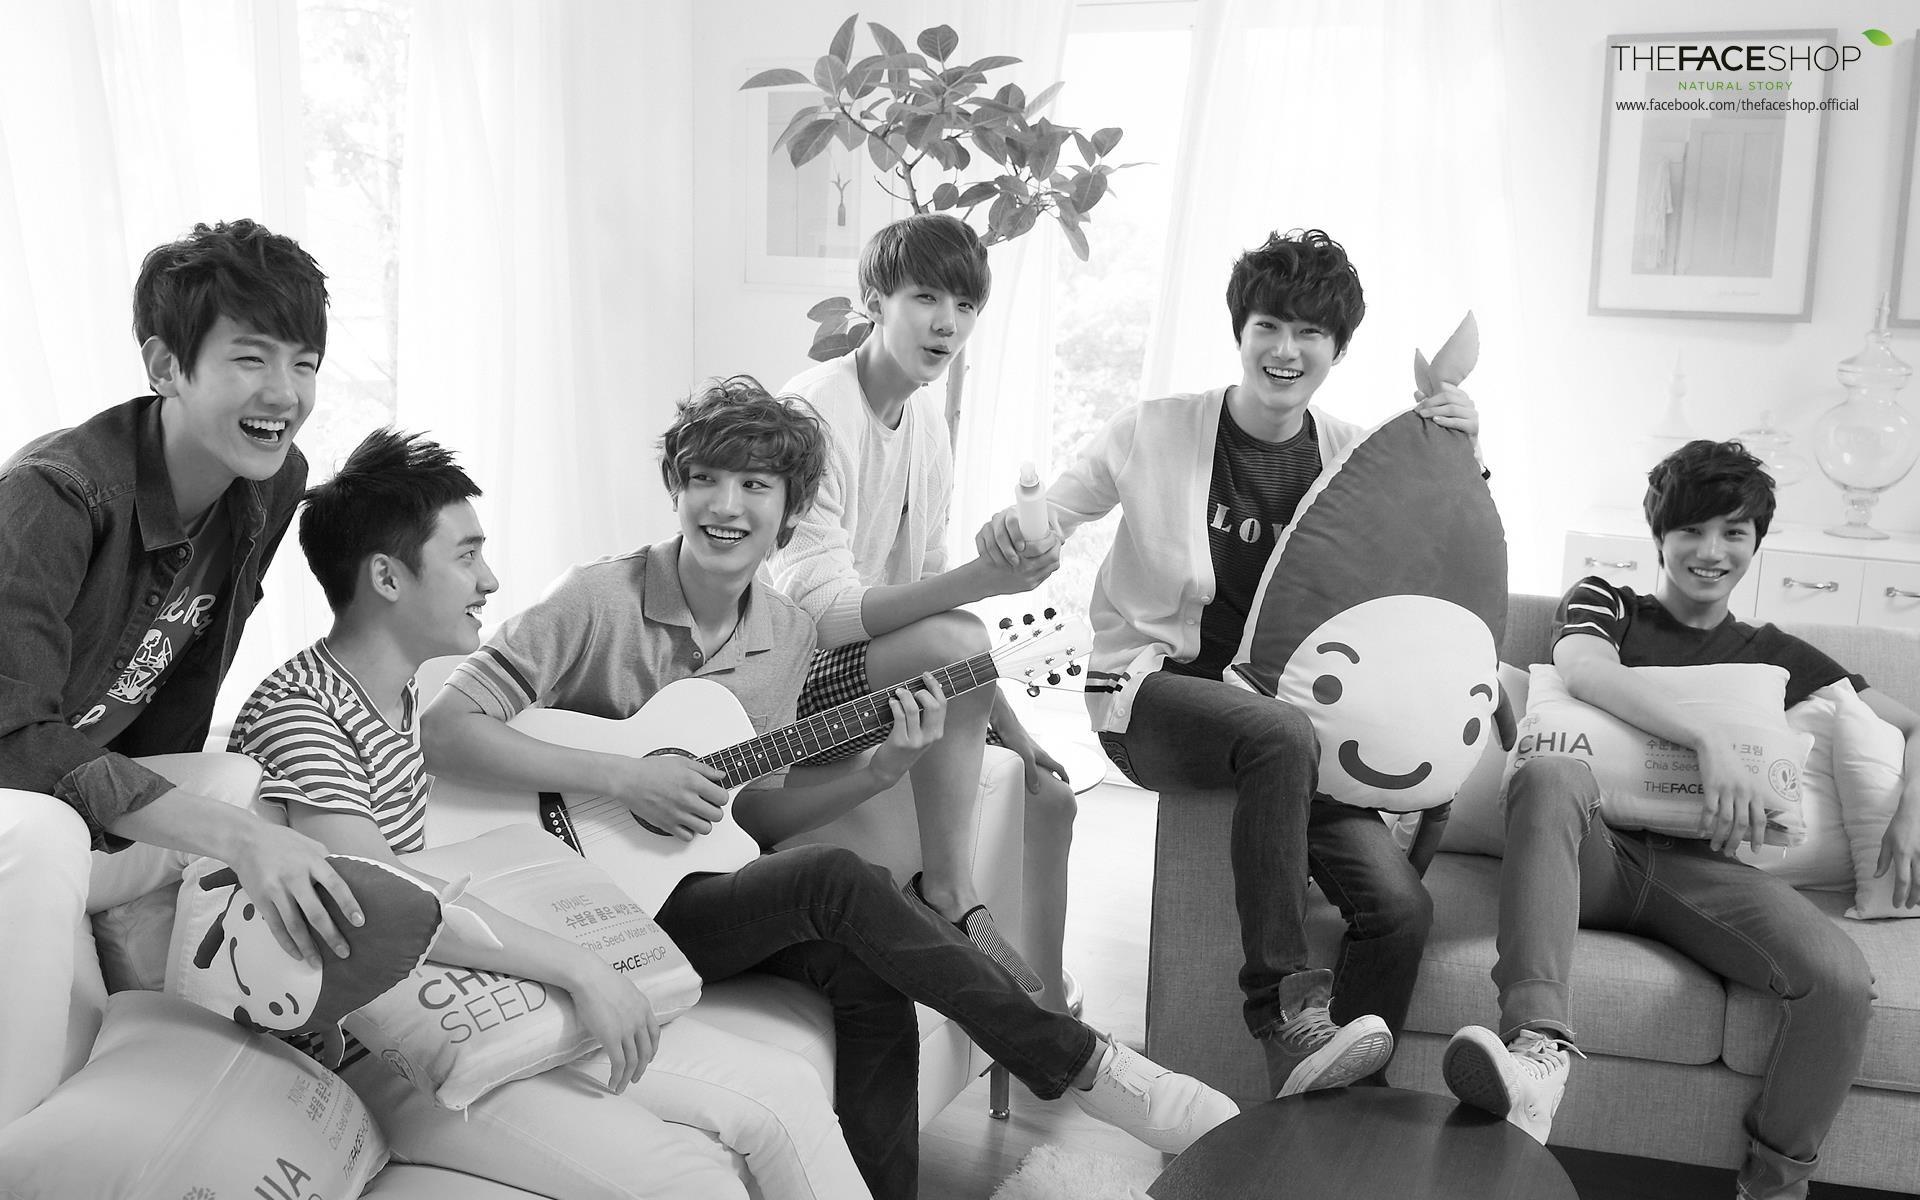 [120630] The Face Shop Official Facebook Update: EXO-K | ExoBear